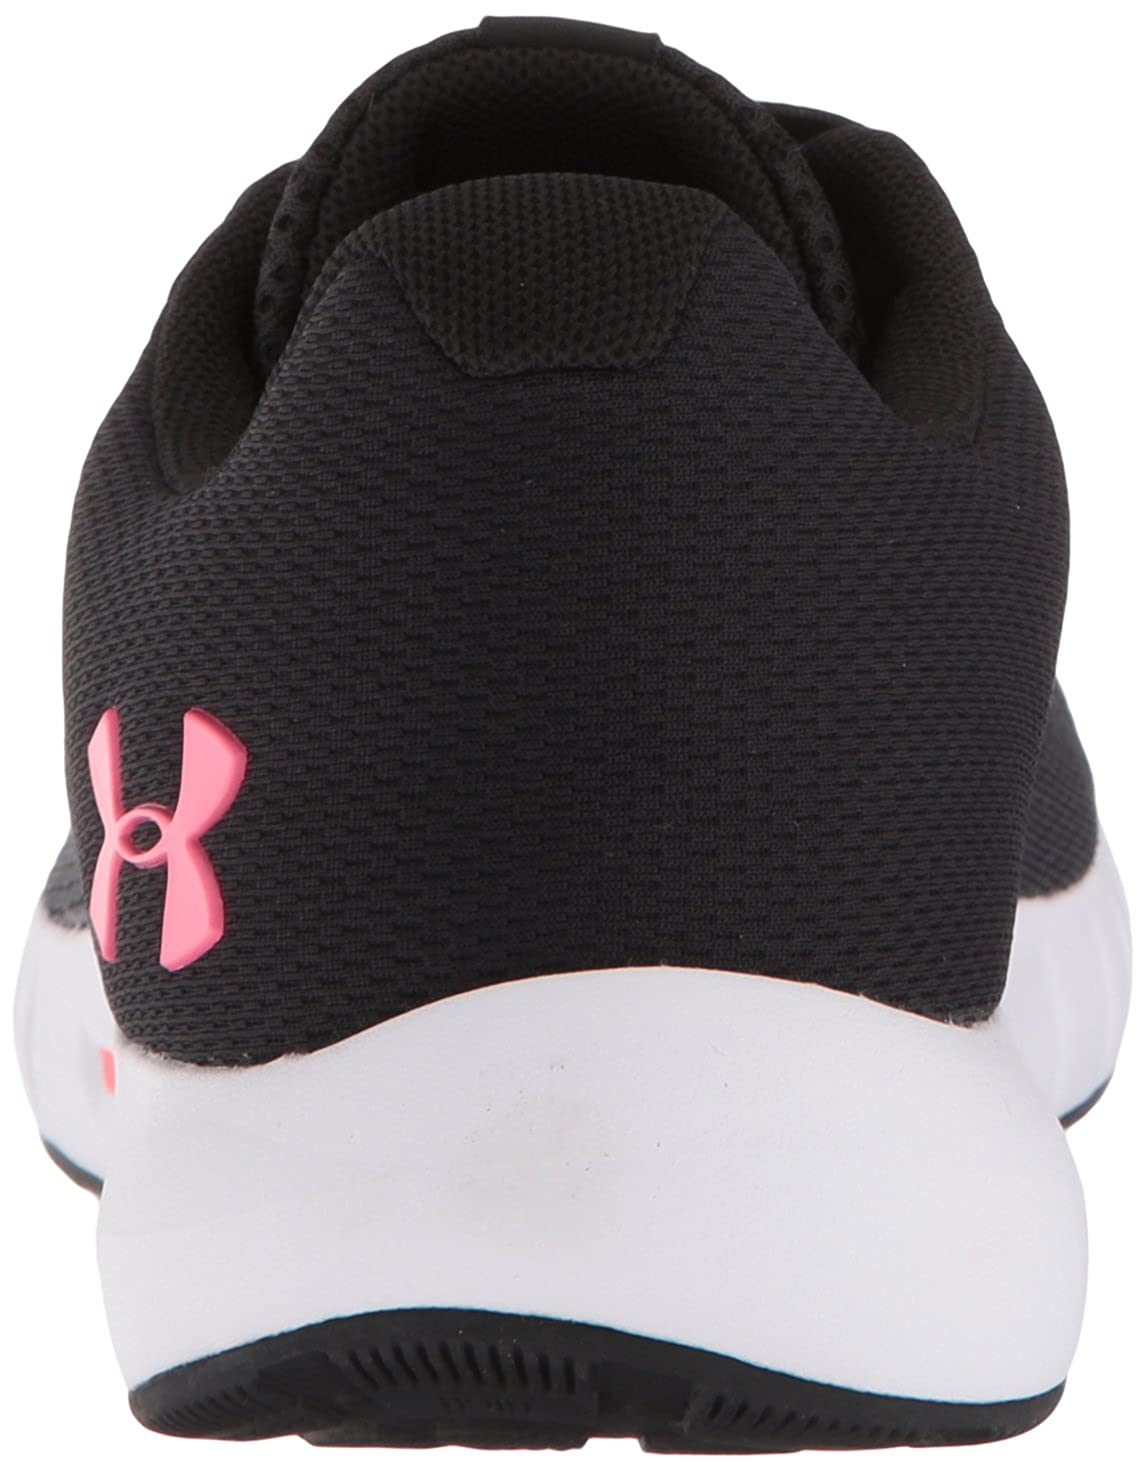 Under Armour G Damen UA W Micro G Armour Pursuit 3000101-001 Sneaker, Mehrfarbig (Grau 001) 700756